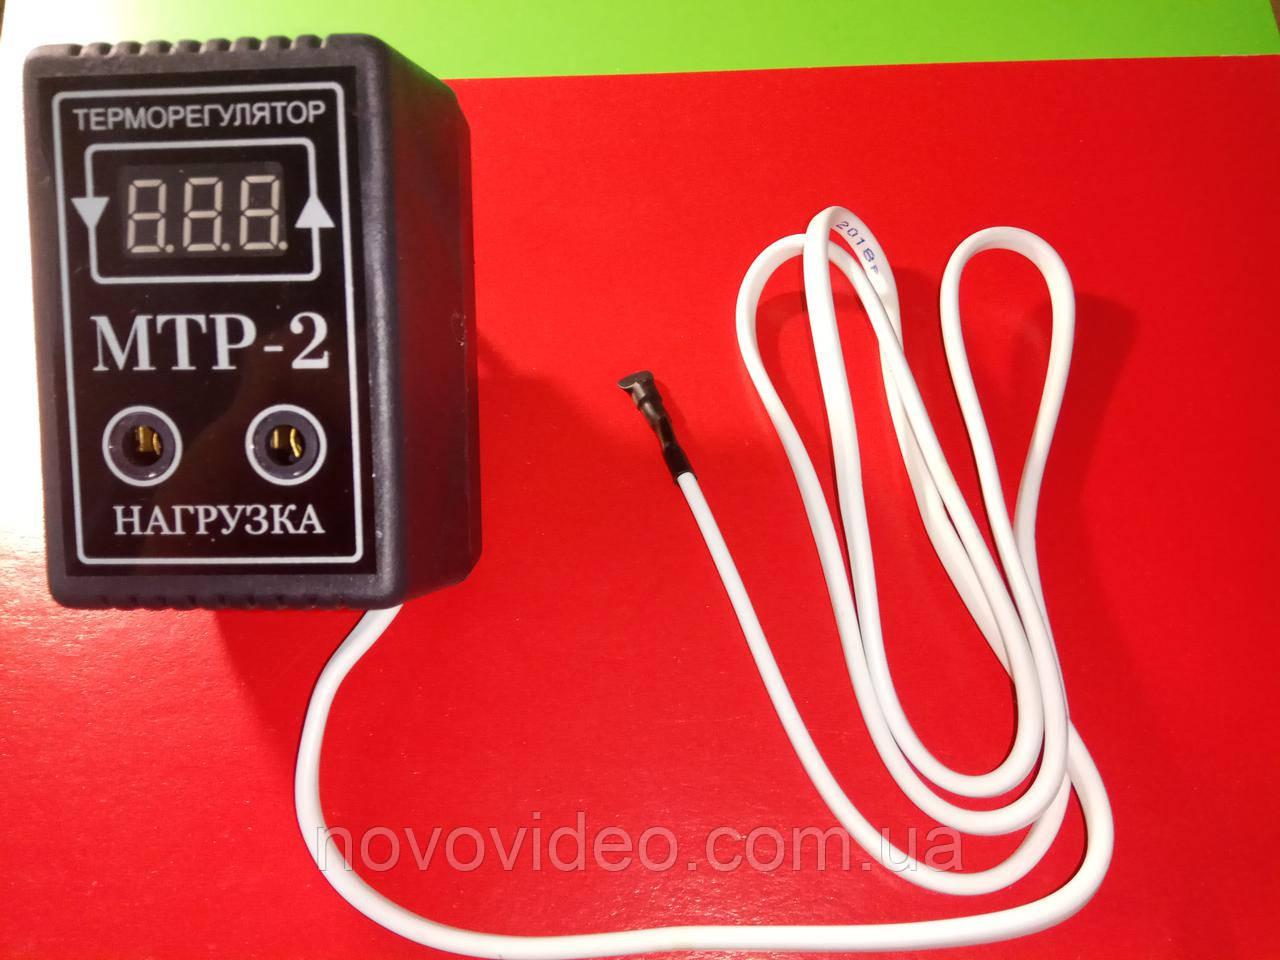 Терморегулятор МТР-2 для отопления цифровой на 10А